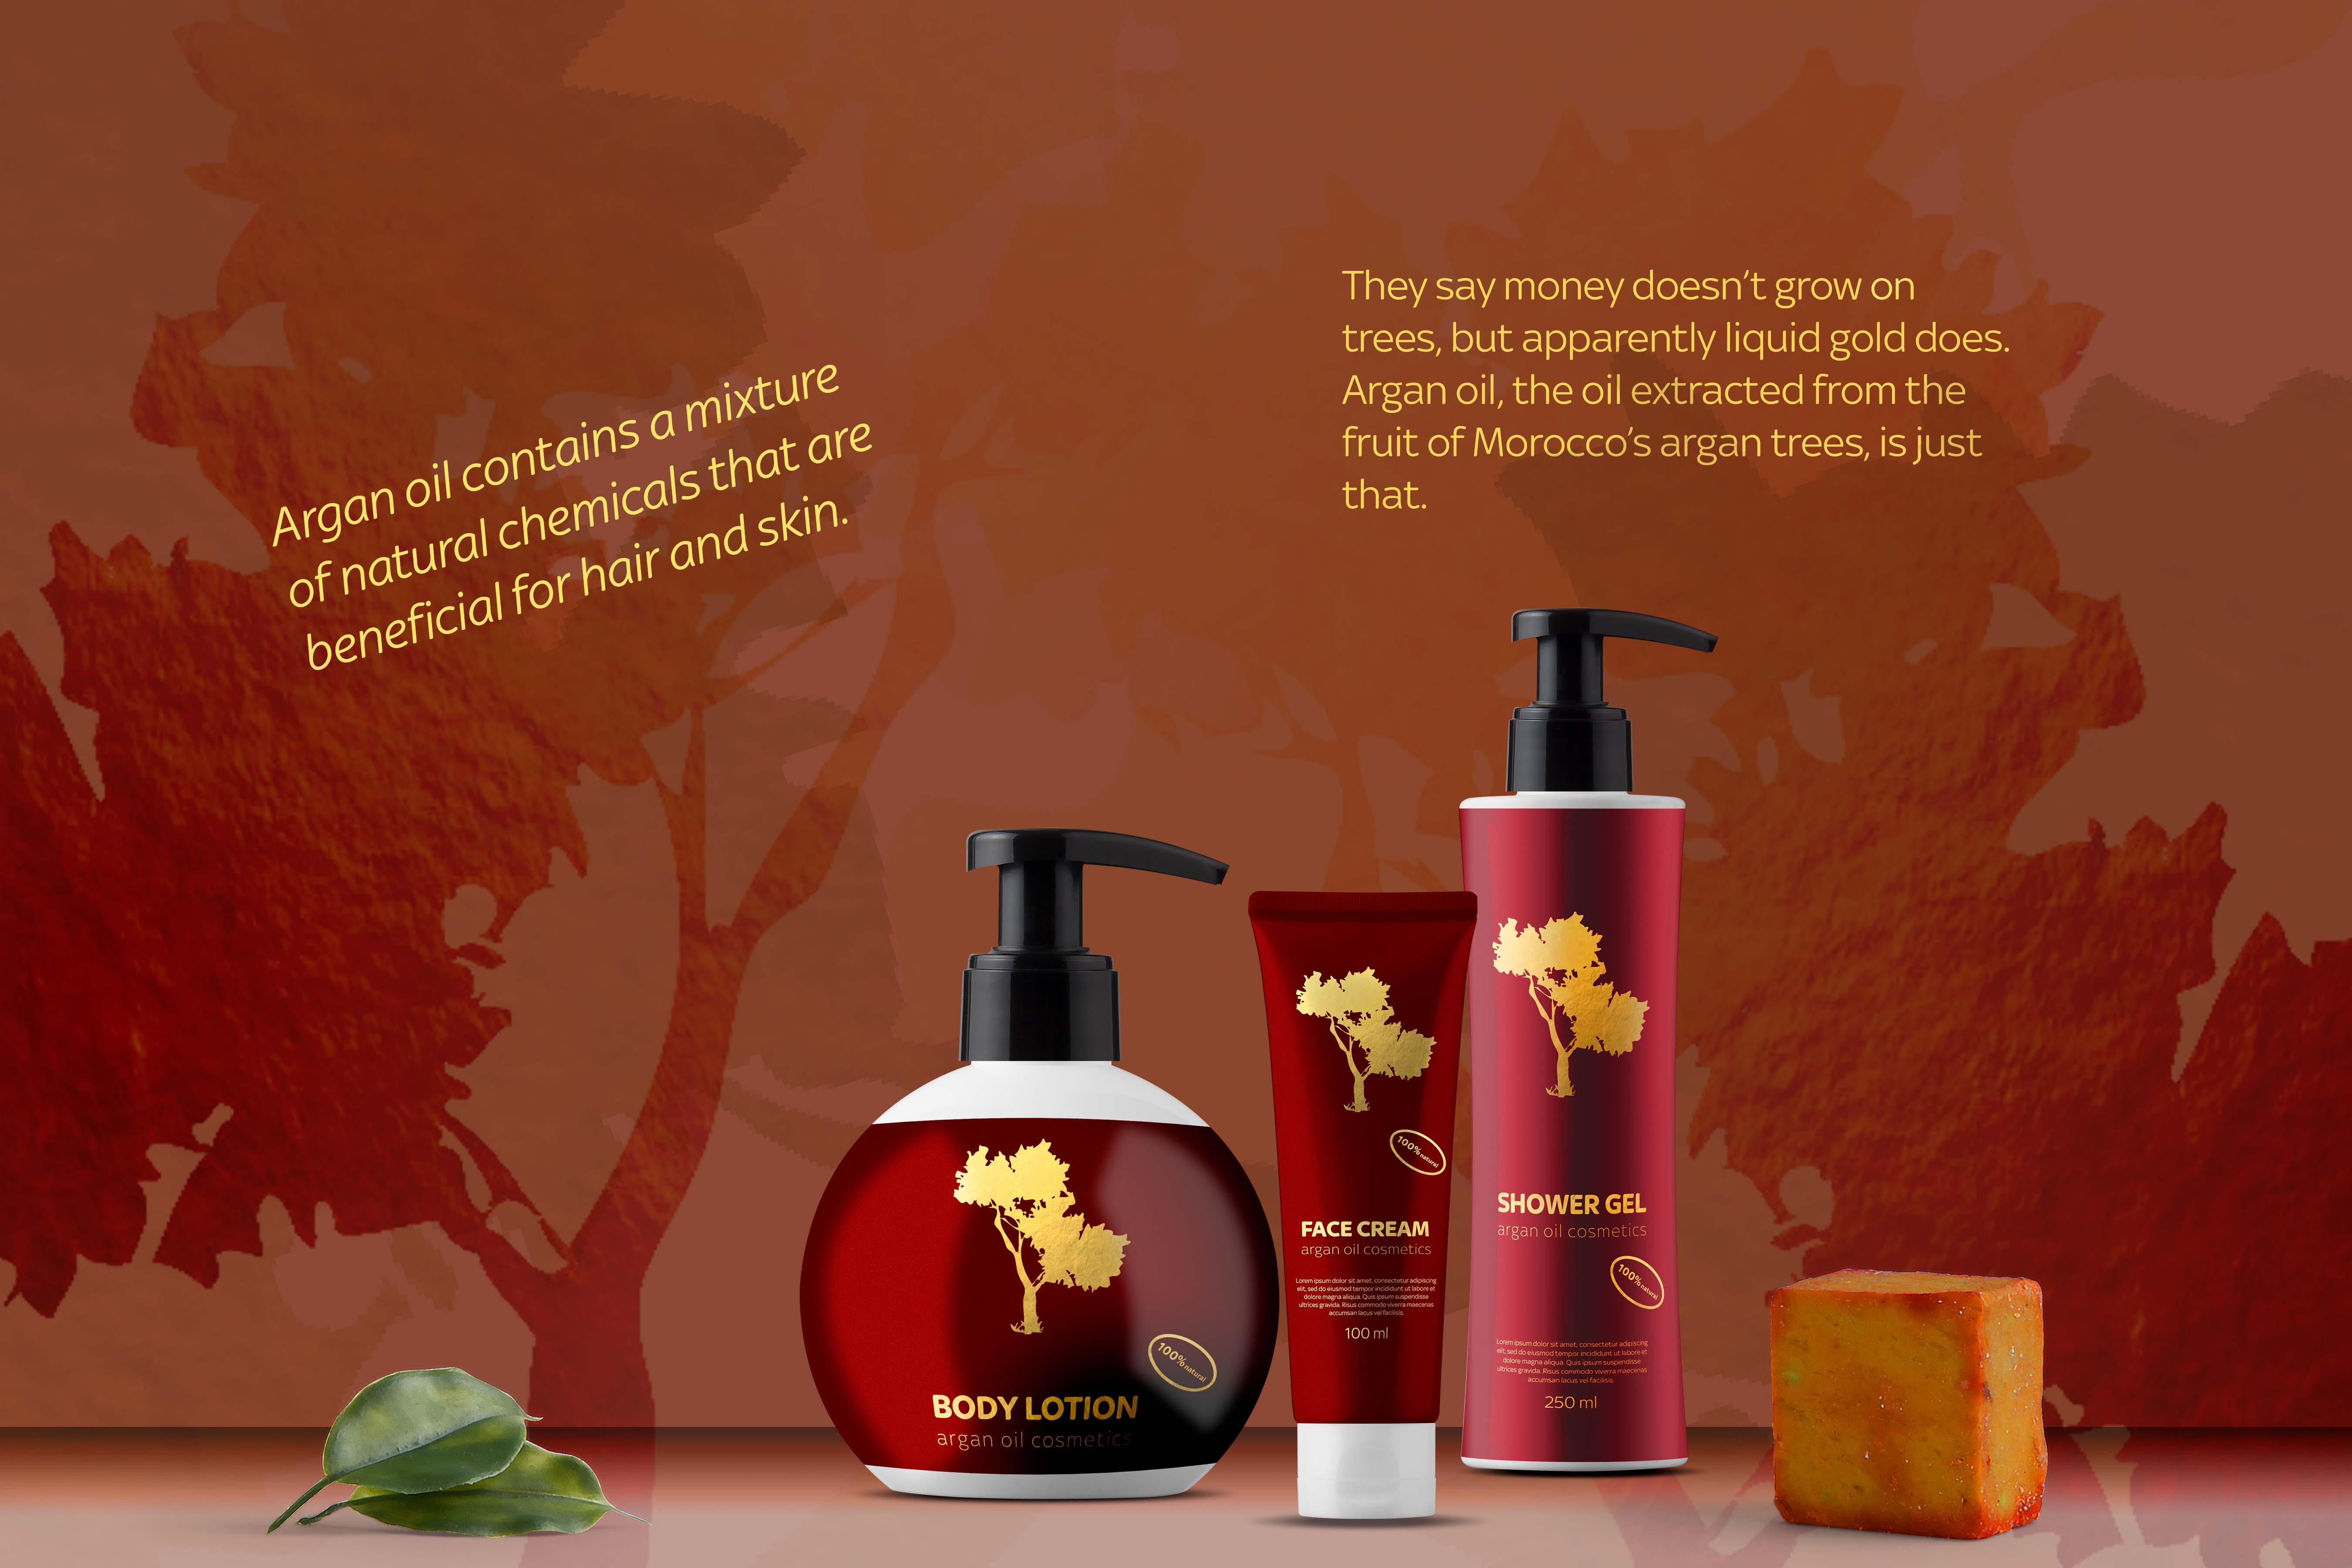 Argan oil cosmetics brand